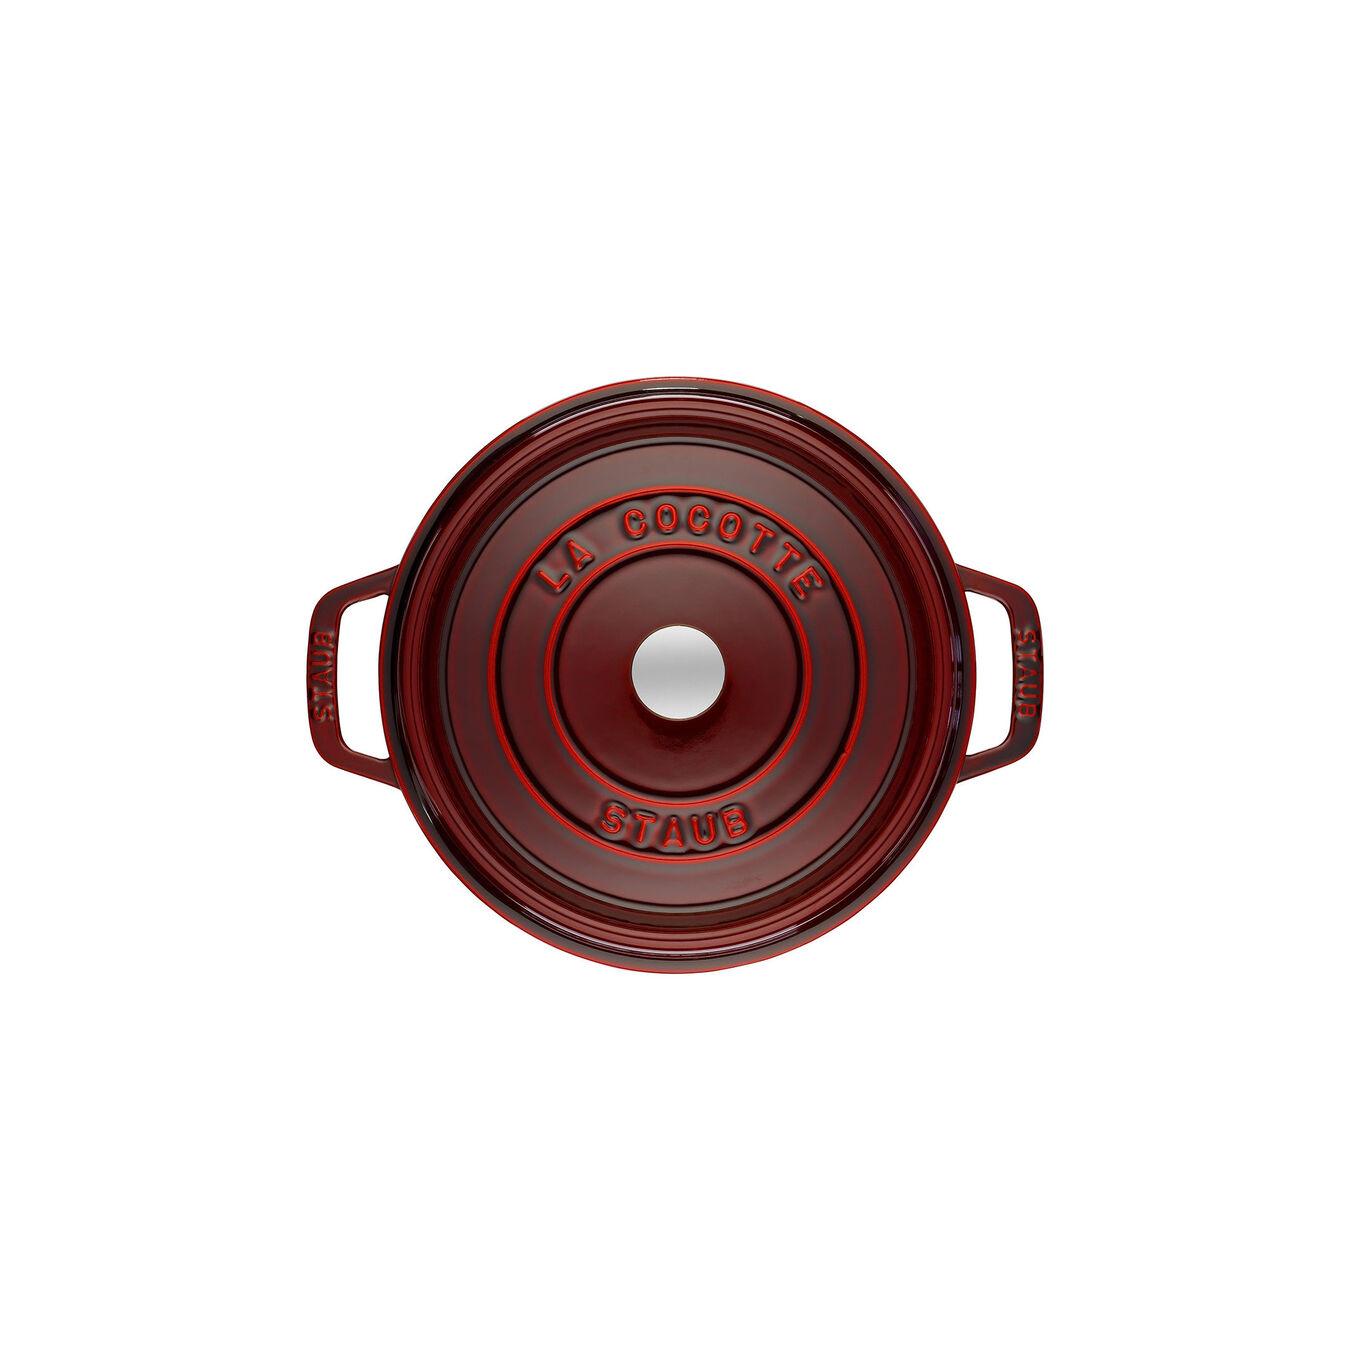 Cocotte rotonda - 22 cm, granatina,,large 2